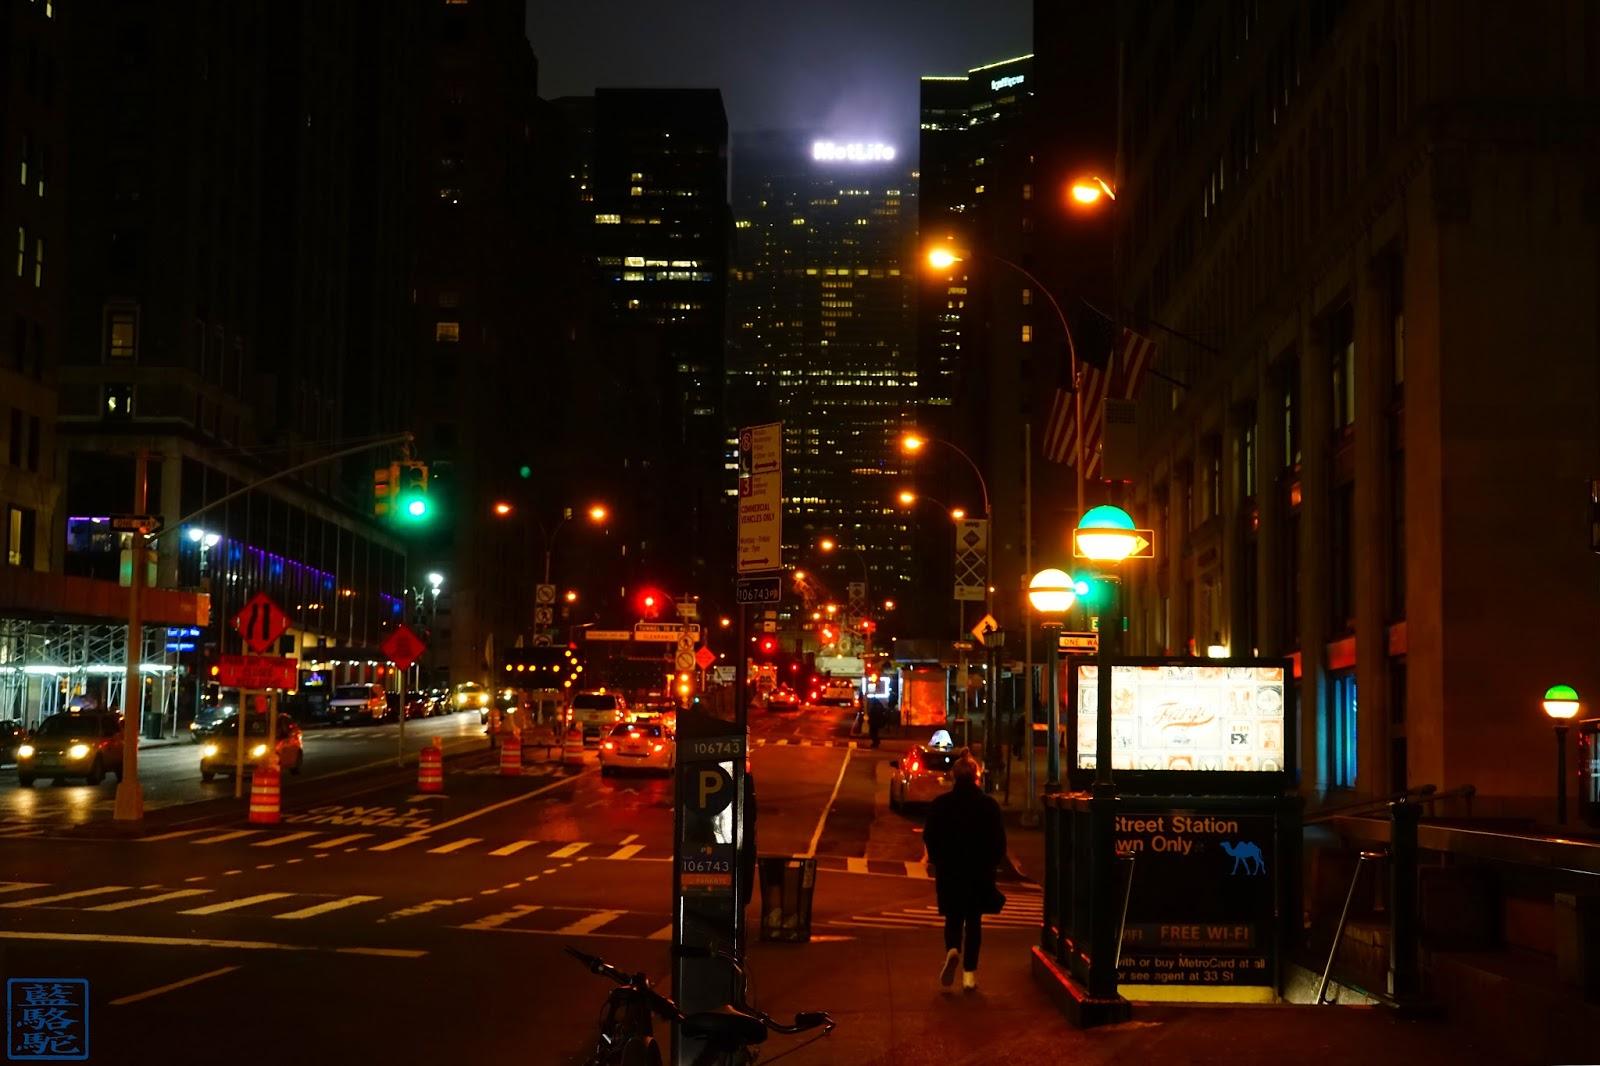 Le Chameau Bleu - Rue de Manhattan à New York  USA